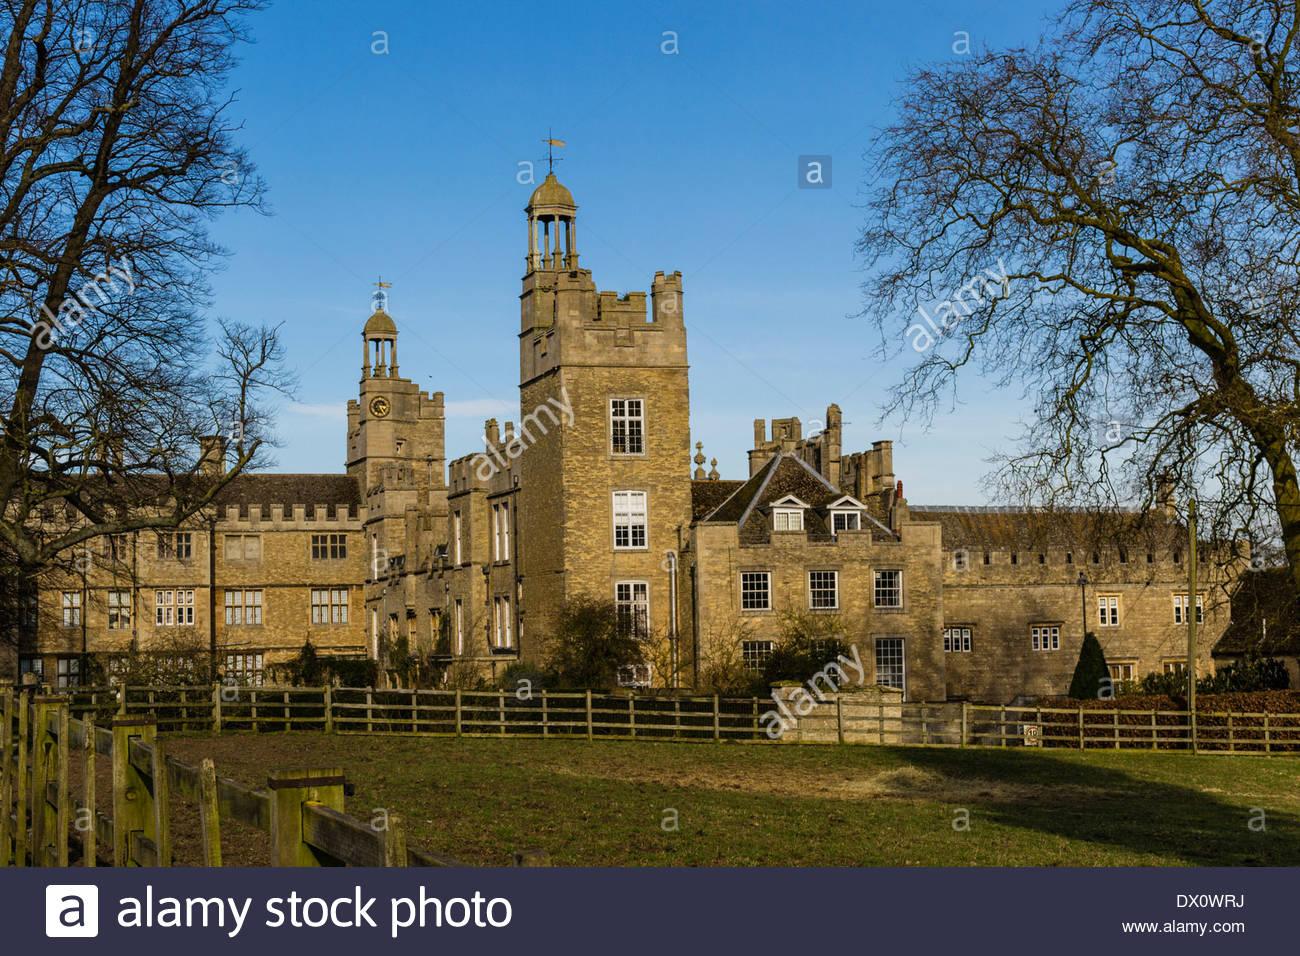 Drayton House, Northamptonshire - Stock Image